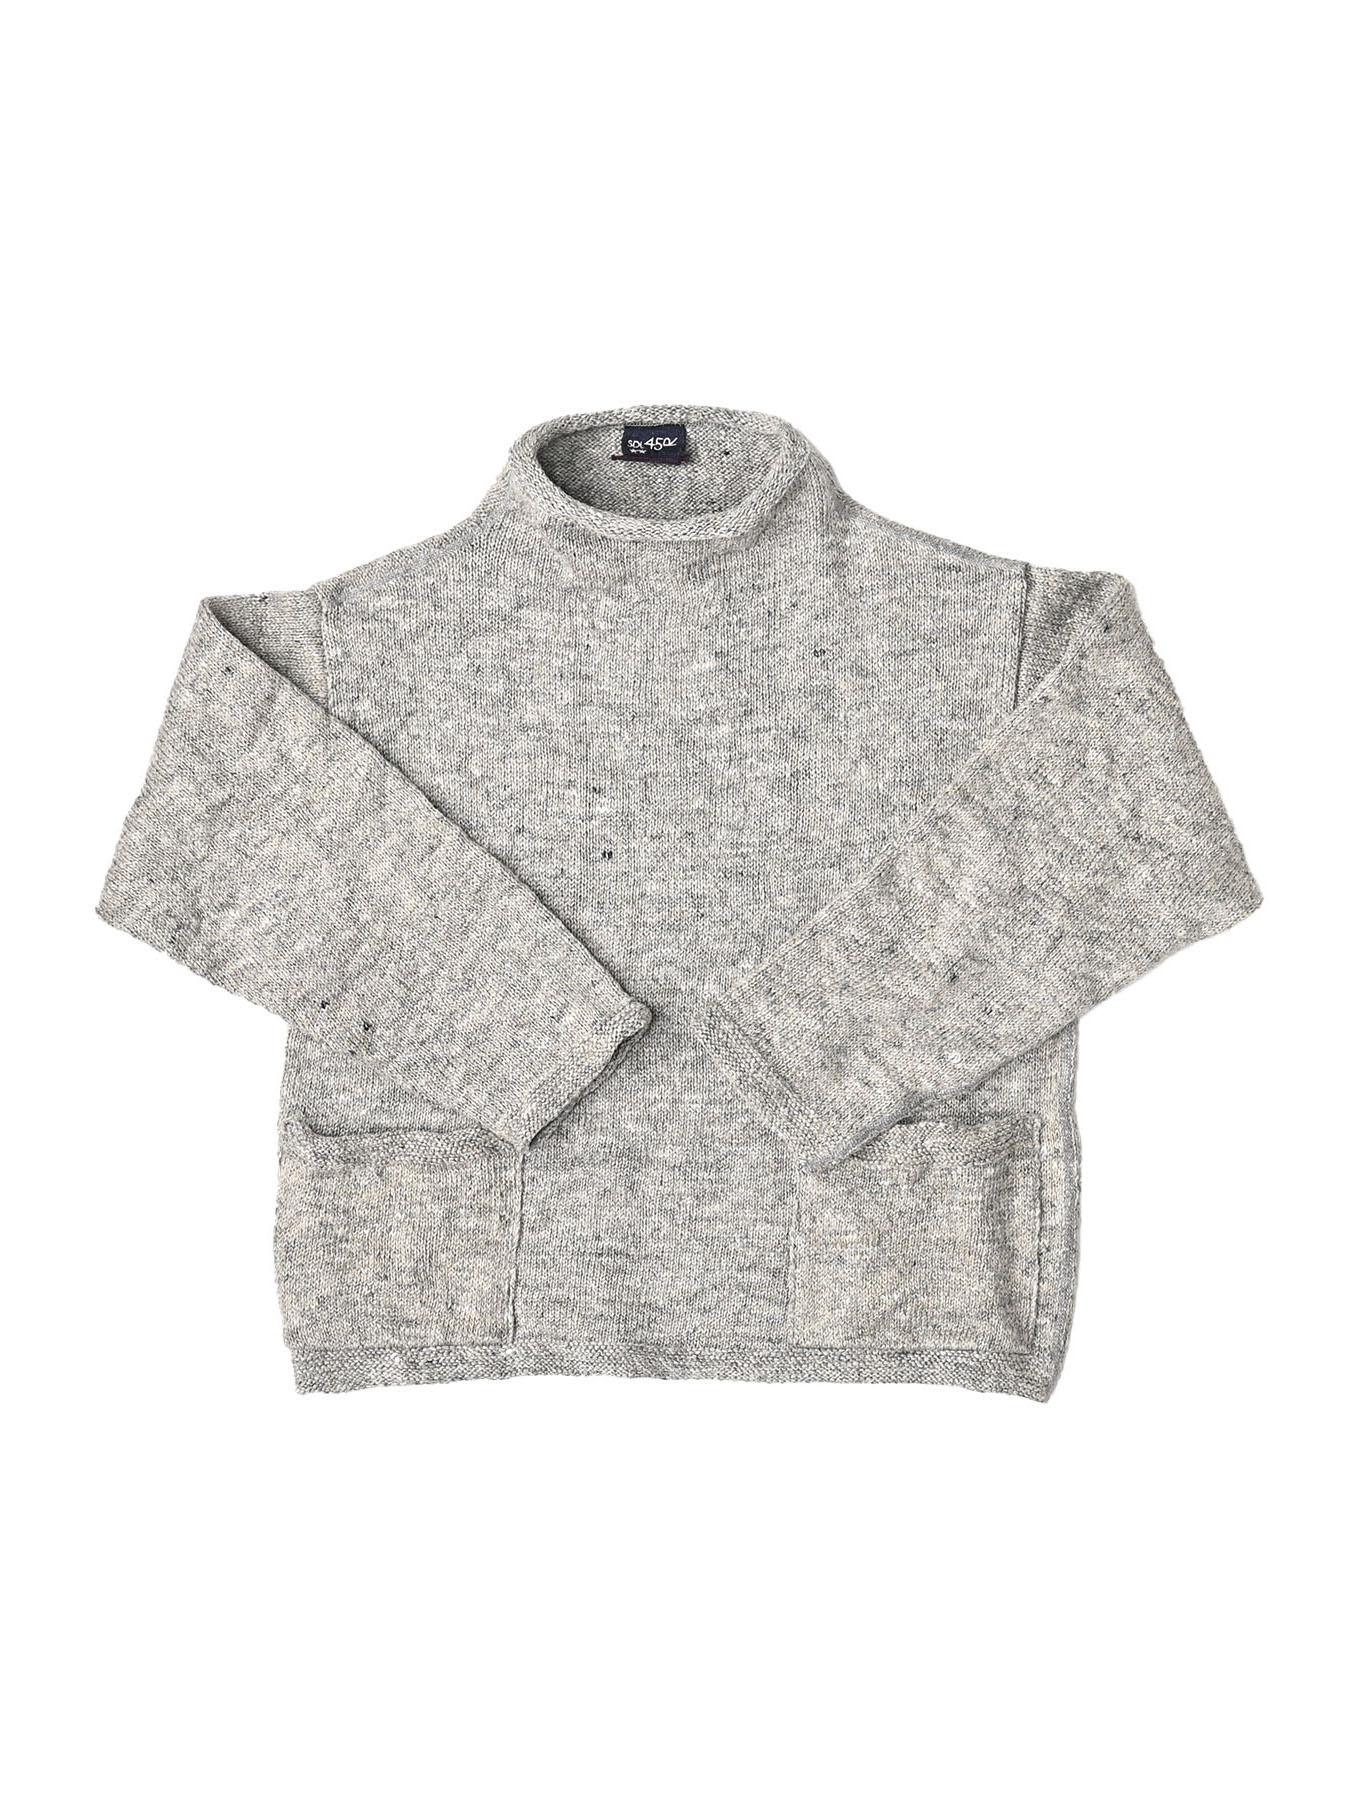 WH Linen Tweed Knit-sew 908 Umahiko Sweater (0321)-9